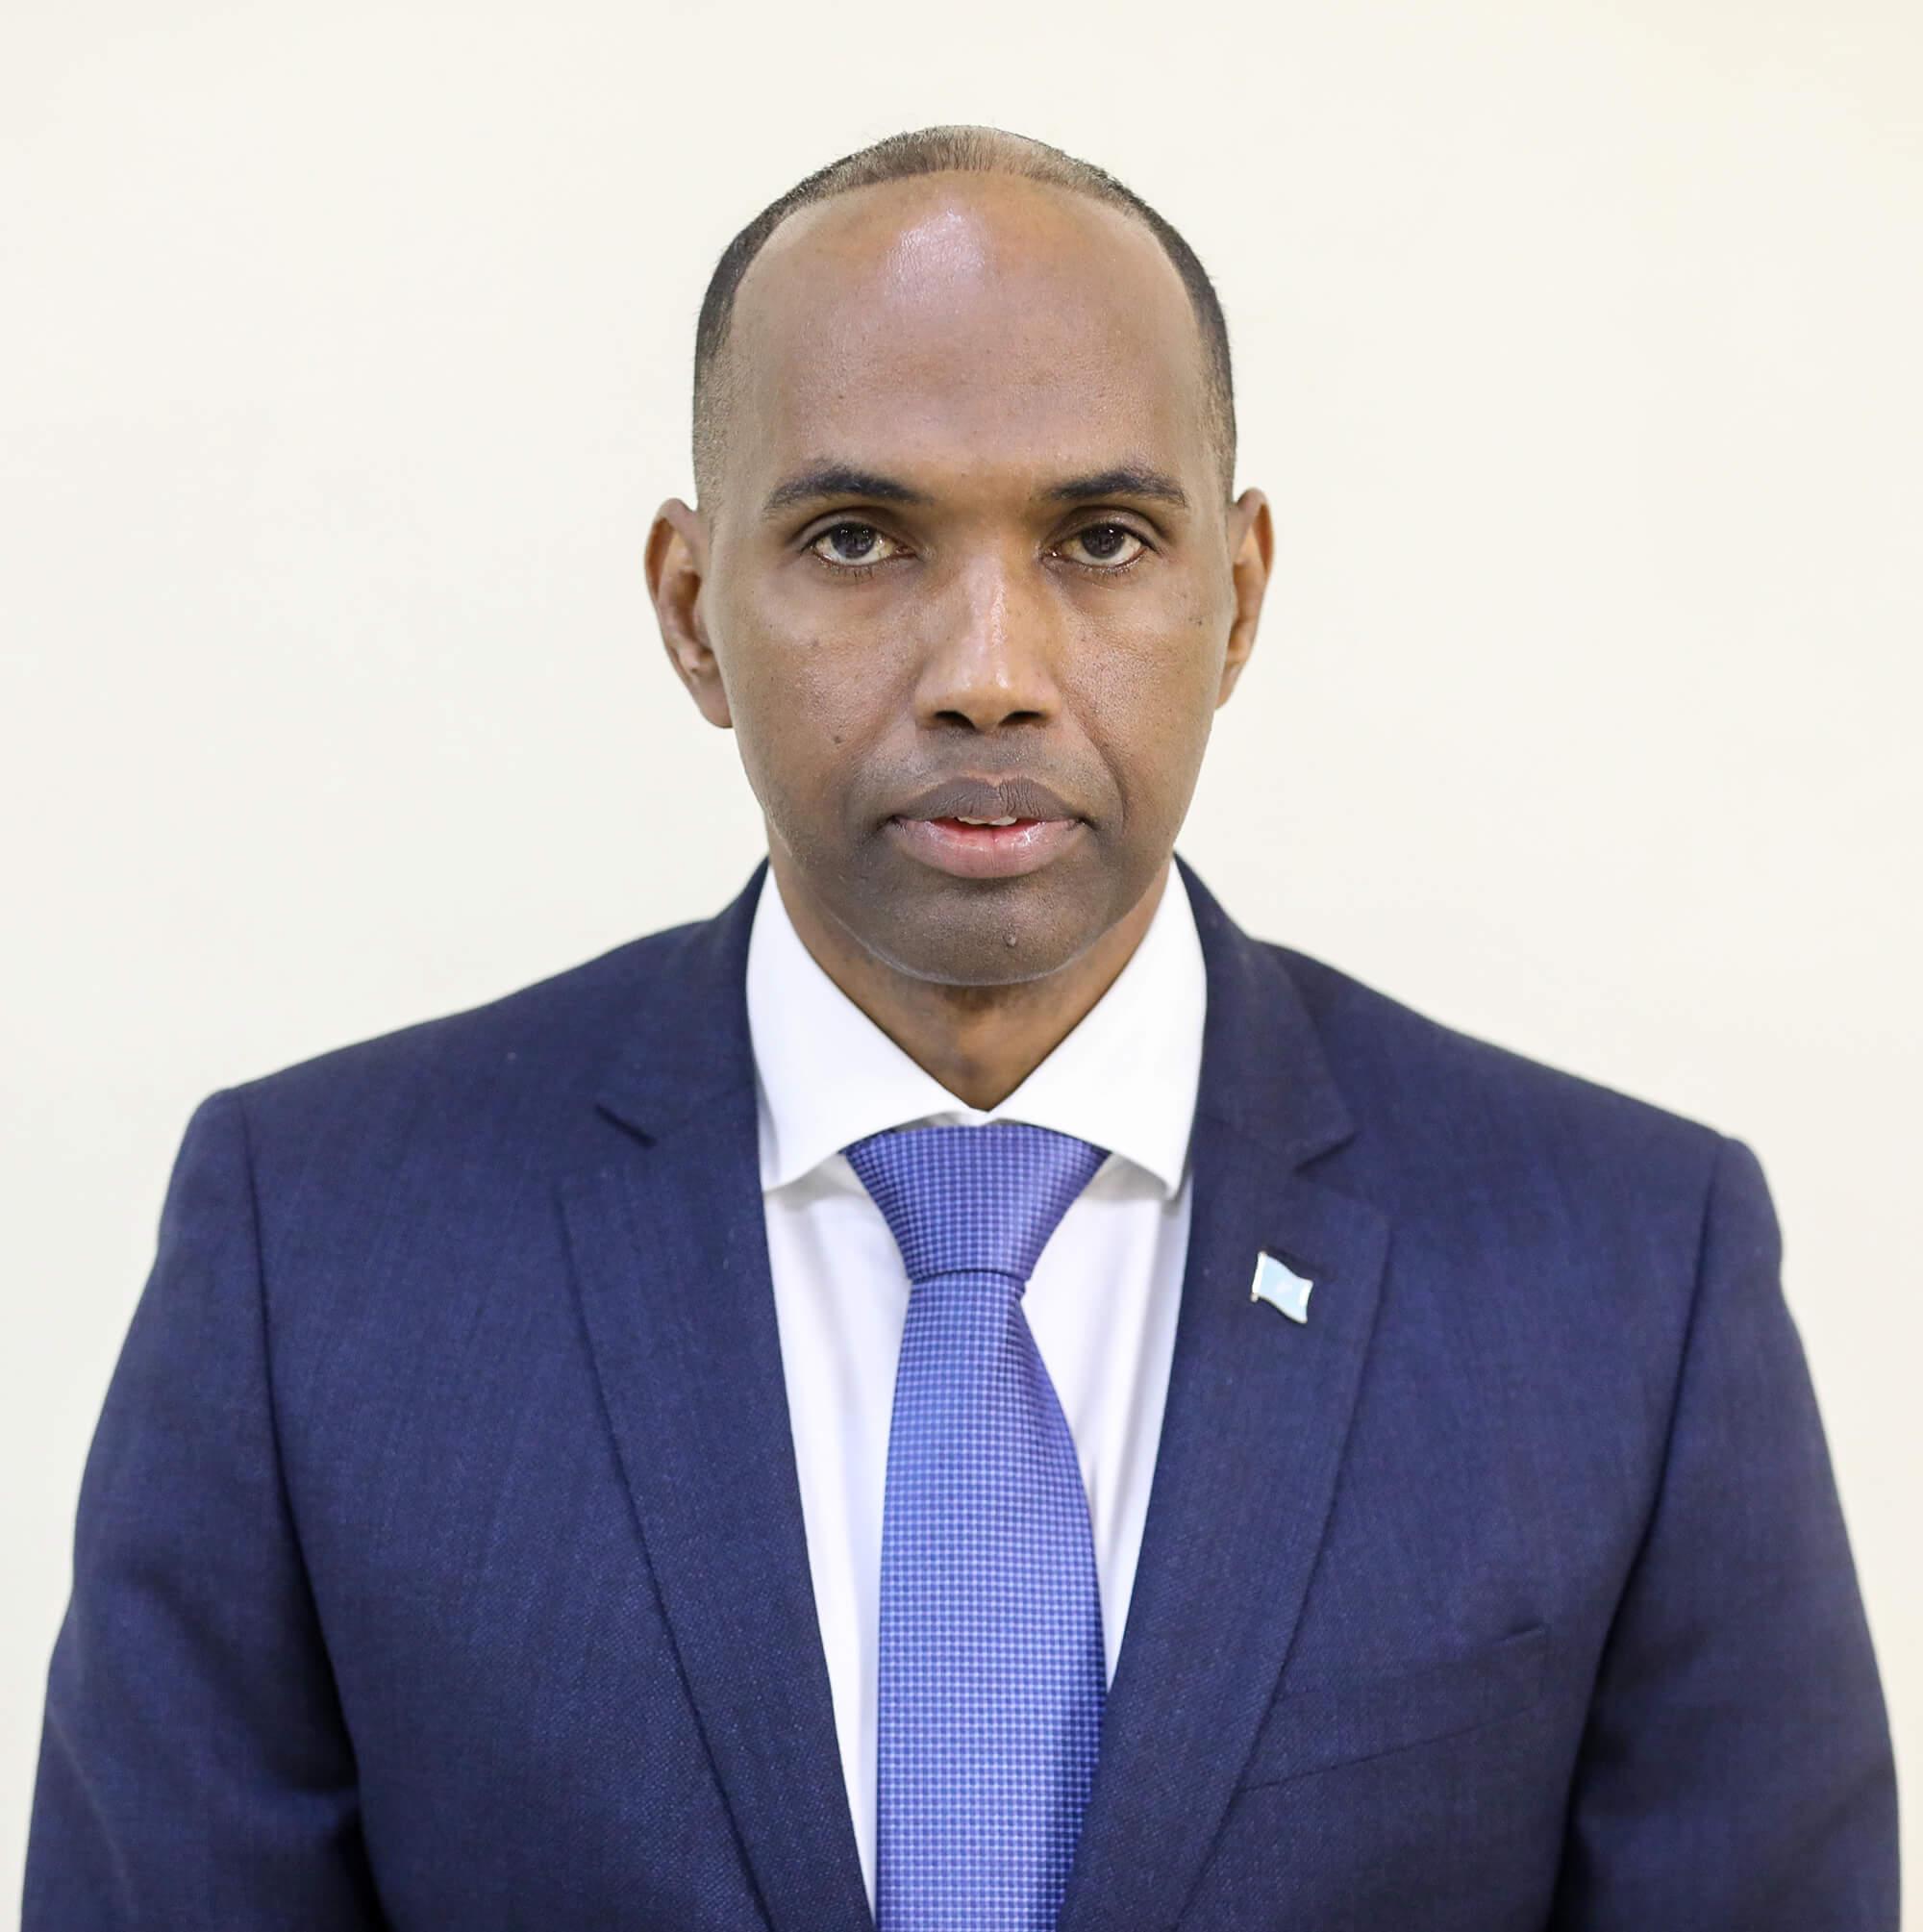 Hassan Ali Khaire - Wikipedia